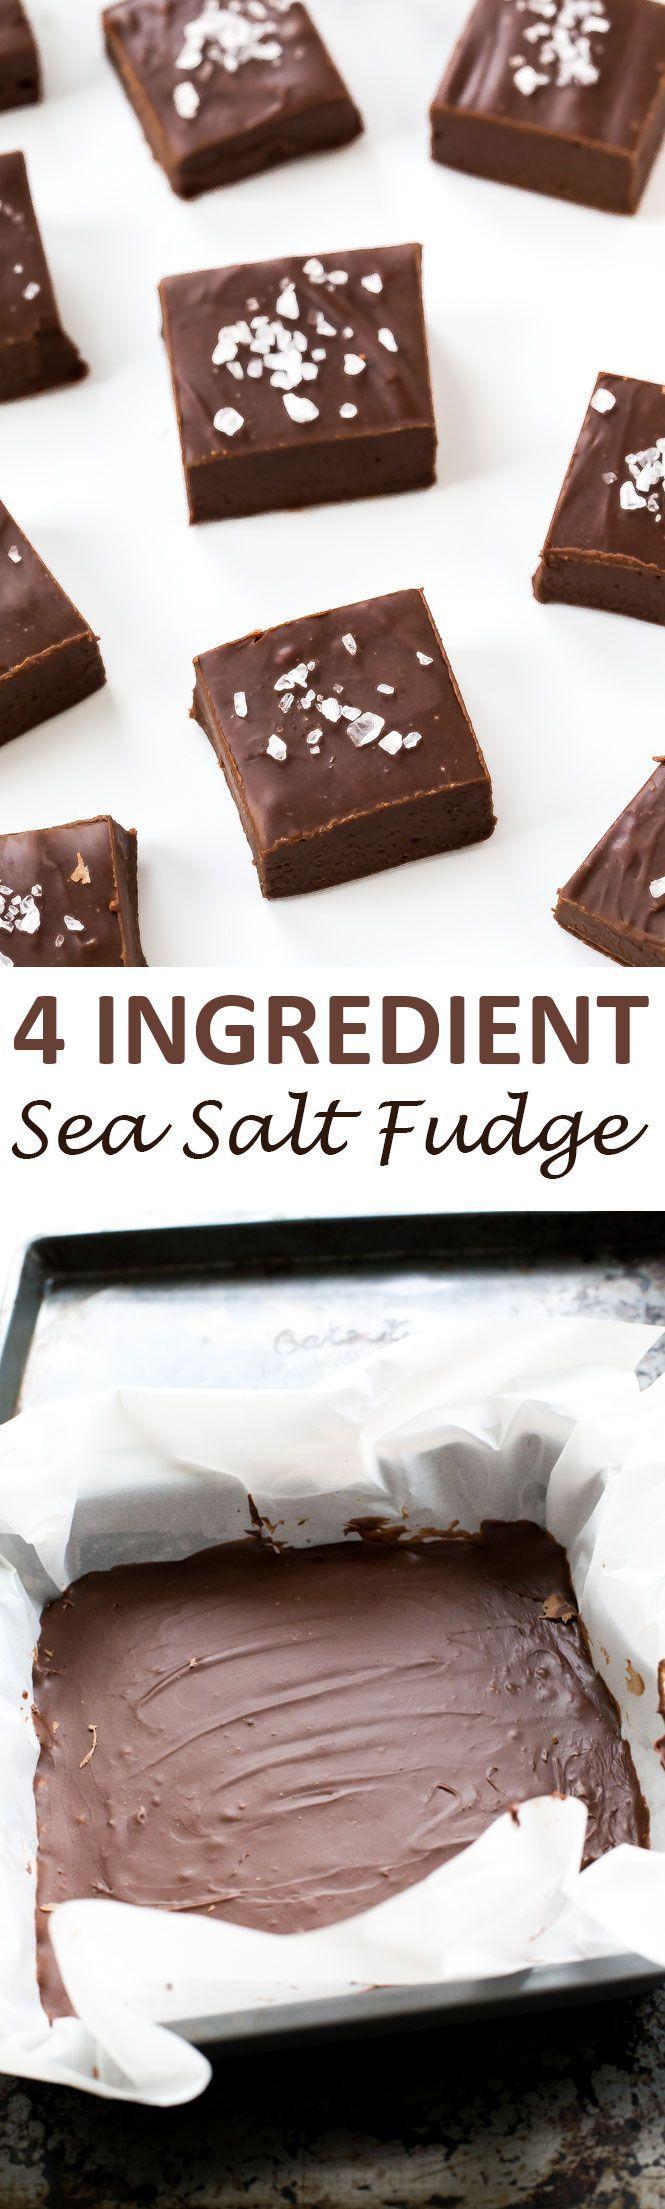 4 Ingredient Fudge with Sea Salt